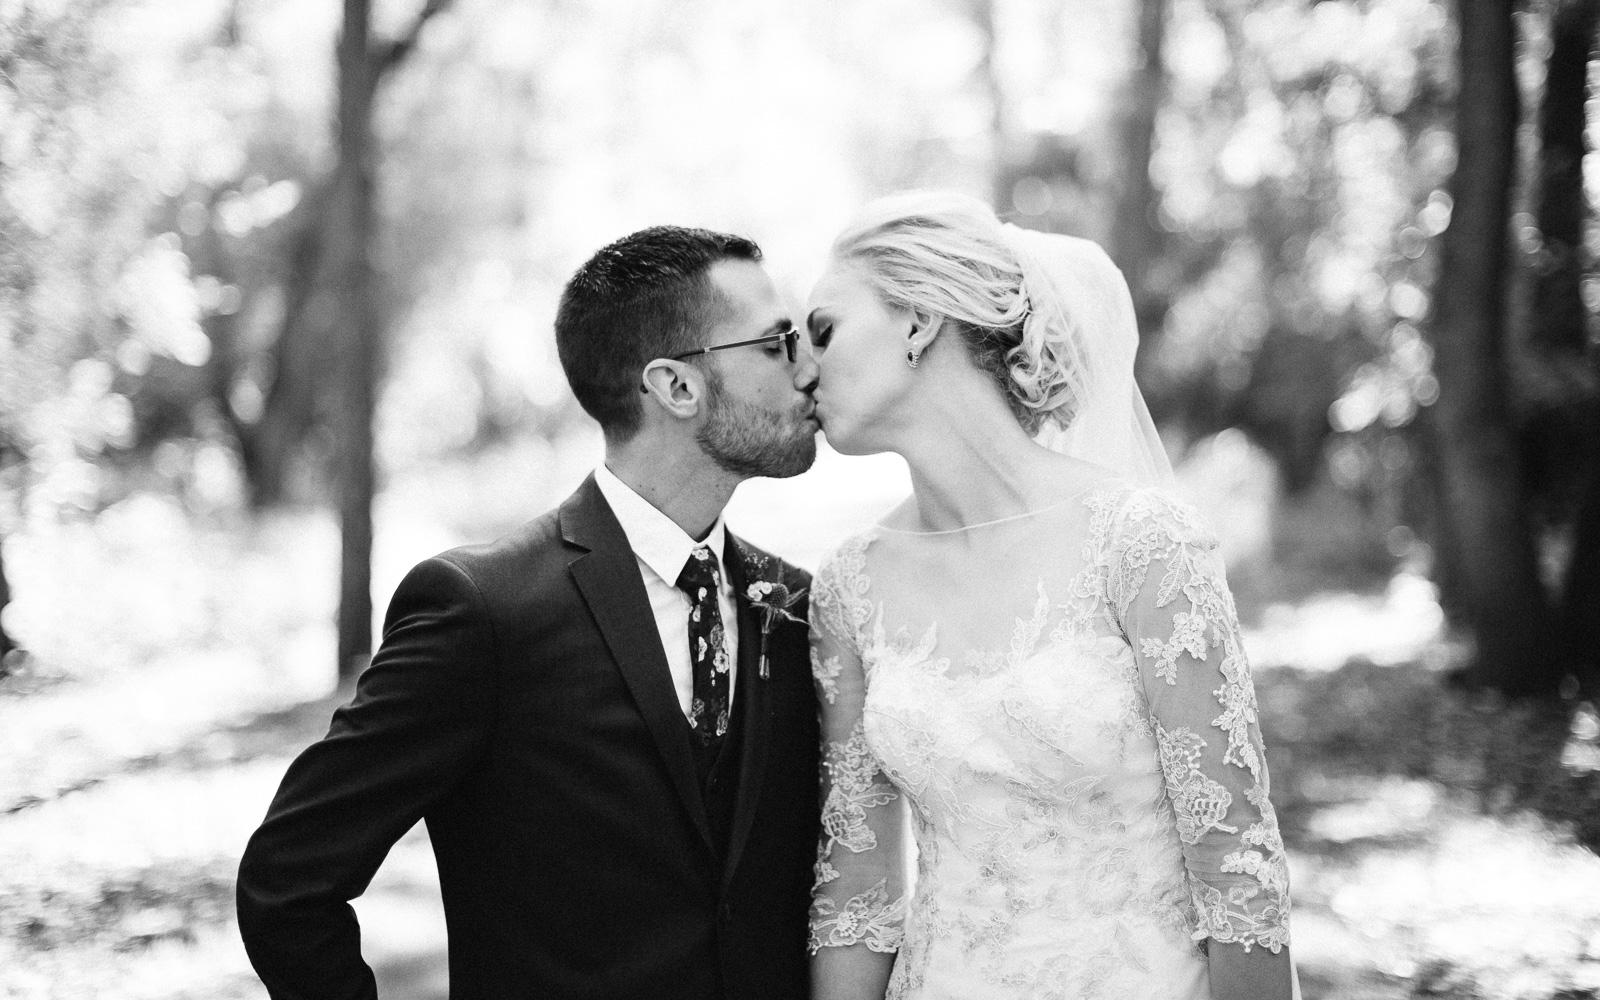 Jenna&Austin_SiouxFalls_Wedding_Photographer_043.jpg